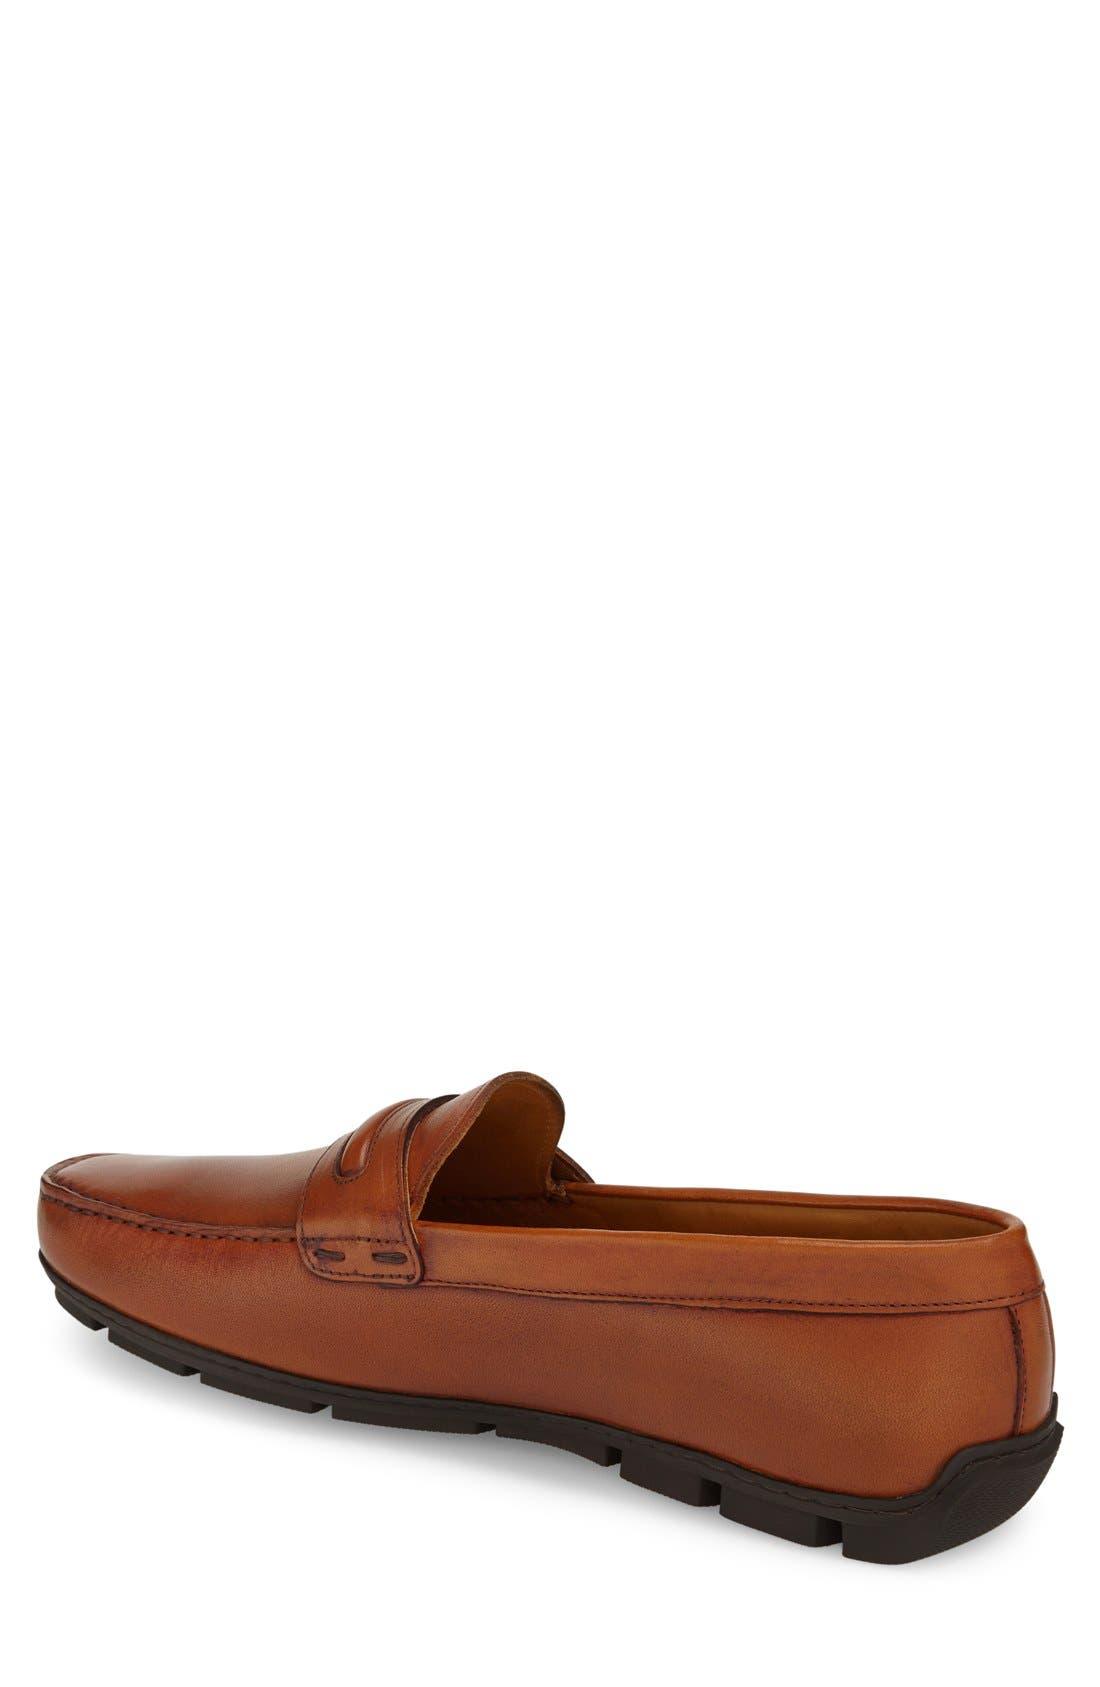 Alternate Image 2  - Vince Camuto 'Donte' Driving Shoe (Men)